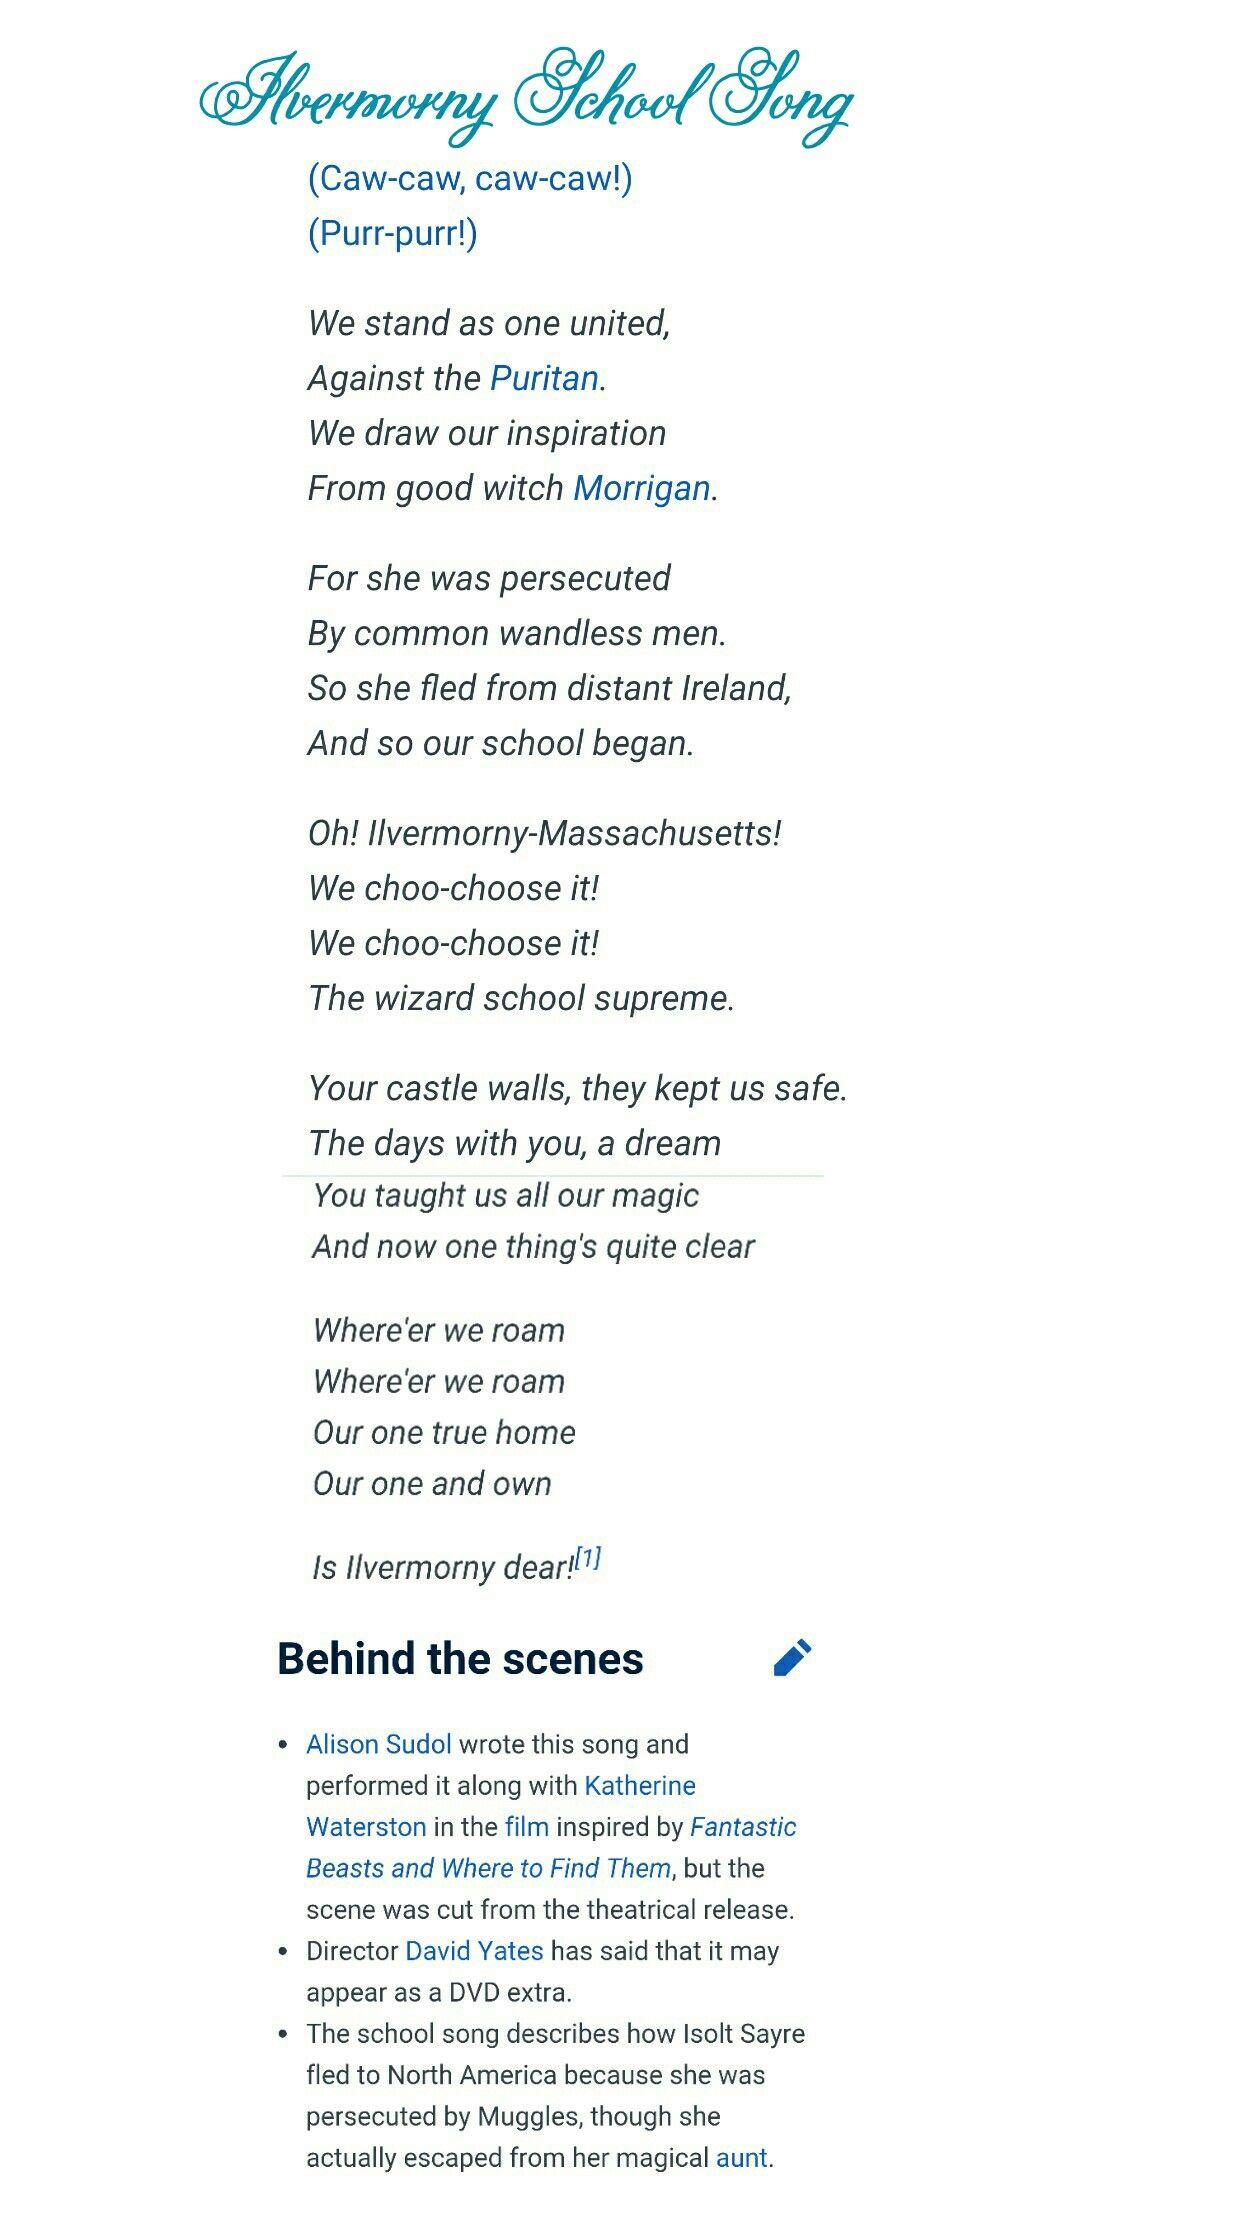 So Much Better Than Freakin Hogwarts Hogwarts Hoggy Warty Hogwarts Teach Us Something Please Seriously This Is School Song Lyrics Ilvermorny School Songs